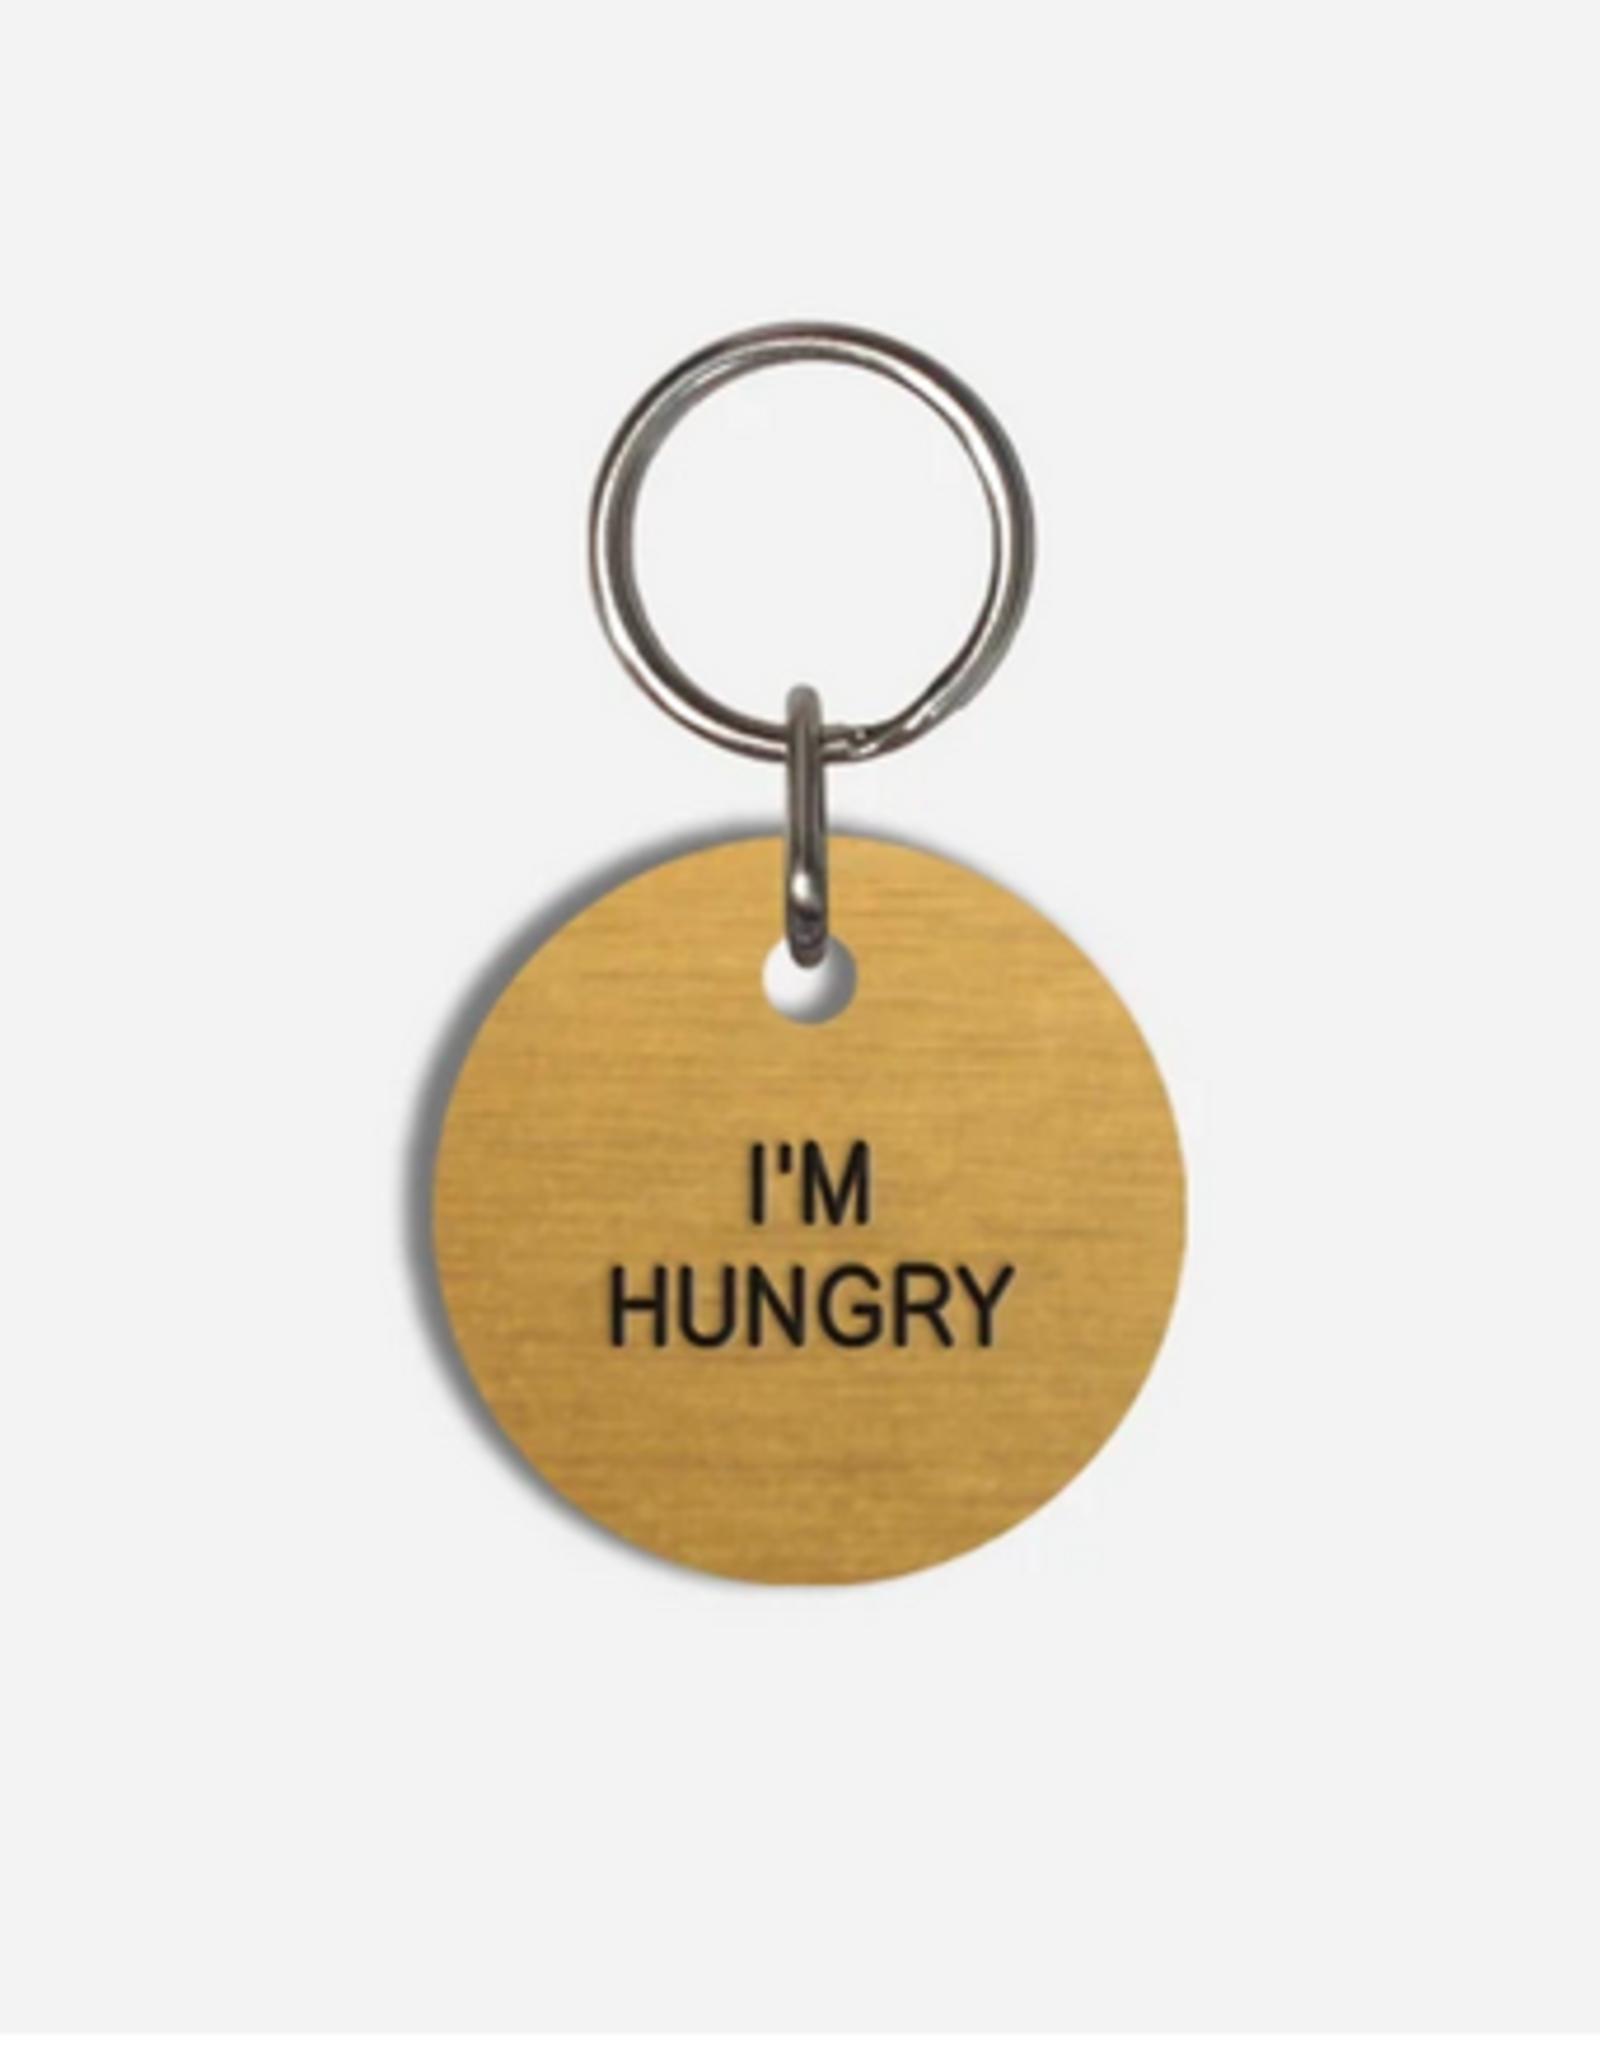 Various Keytags pet tag - I'M HUNGRY